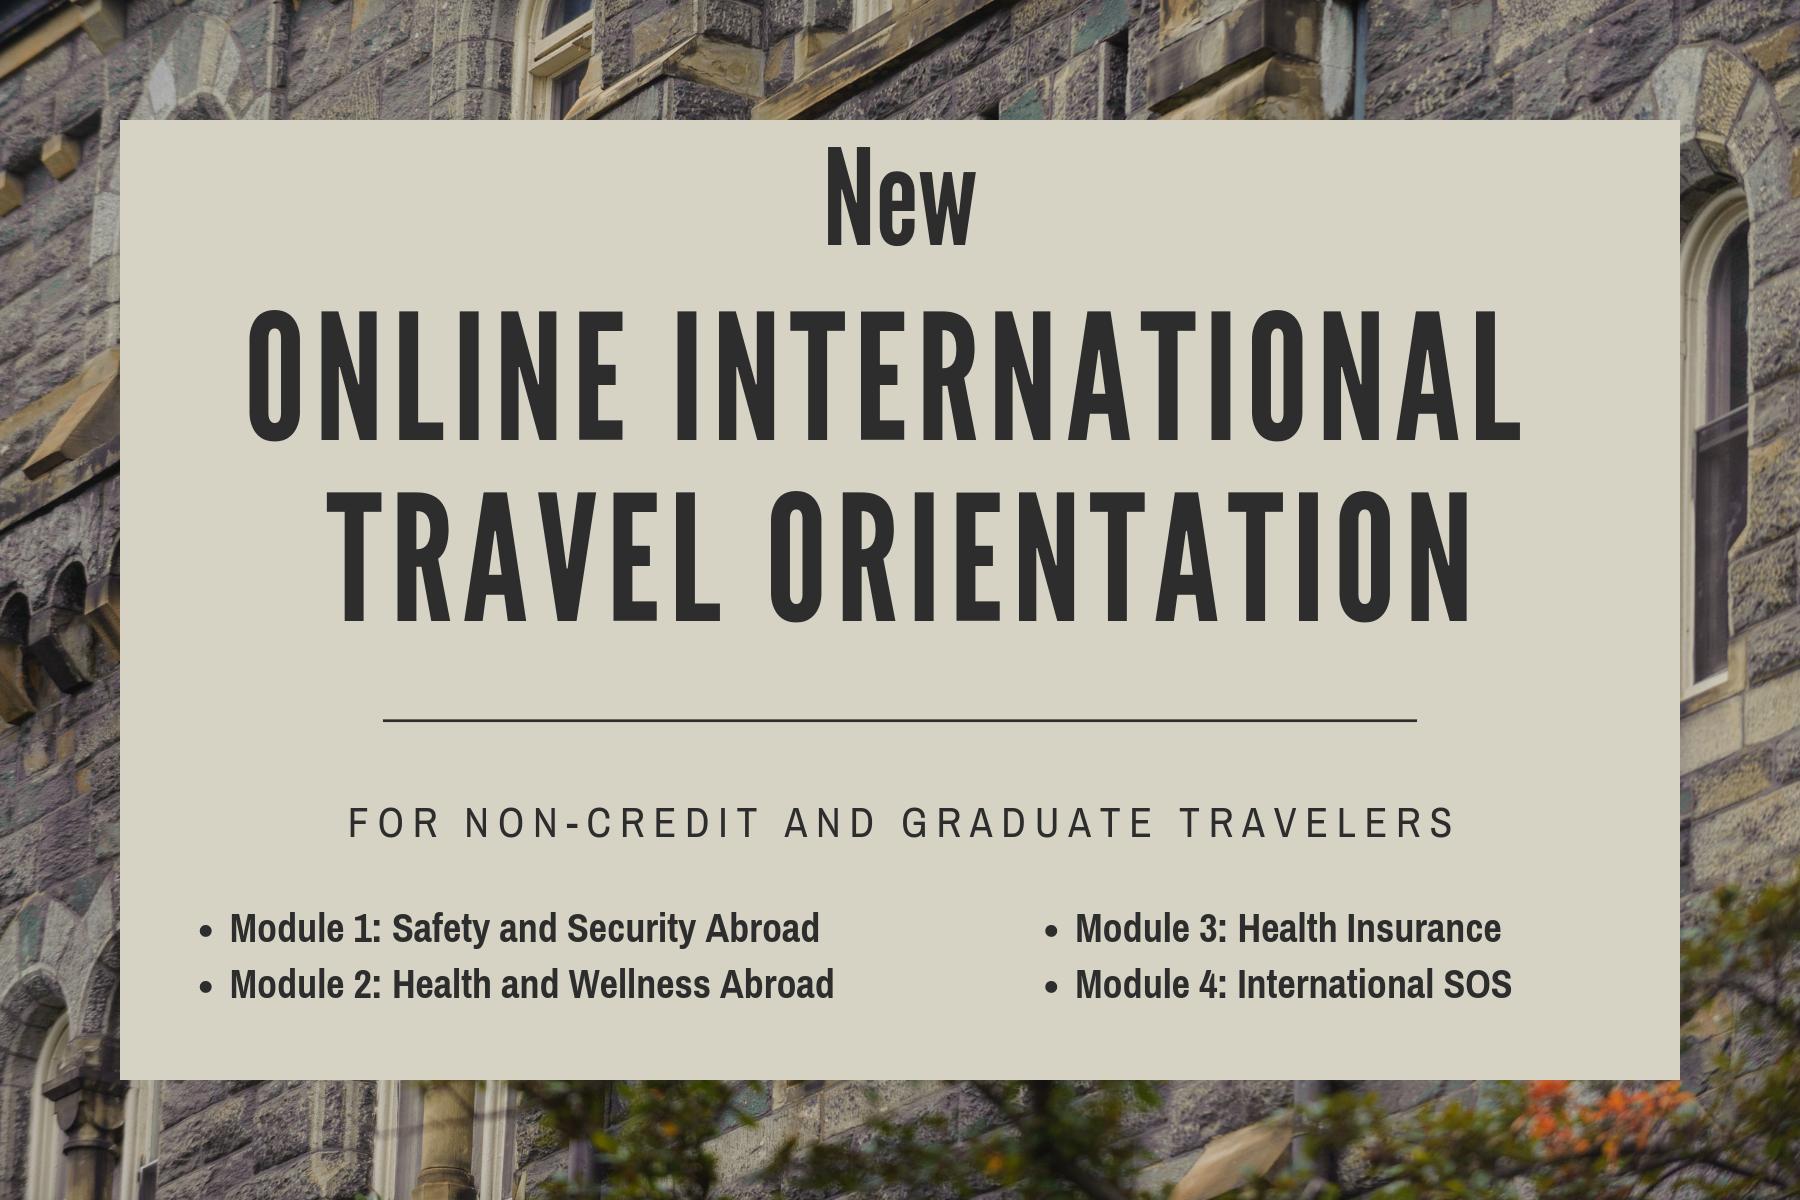 online_travel_orientation_ad_v2_1